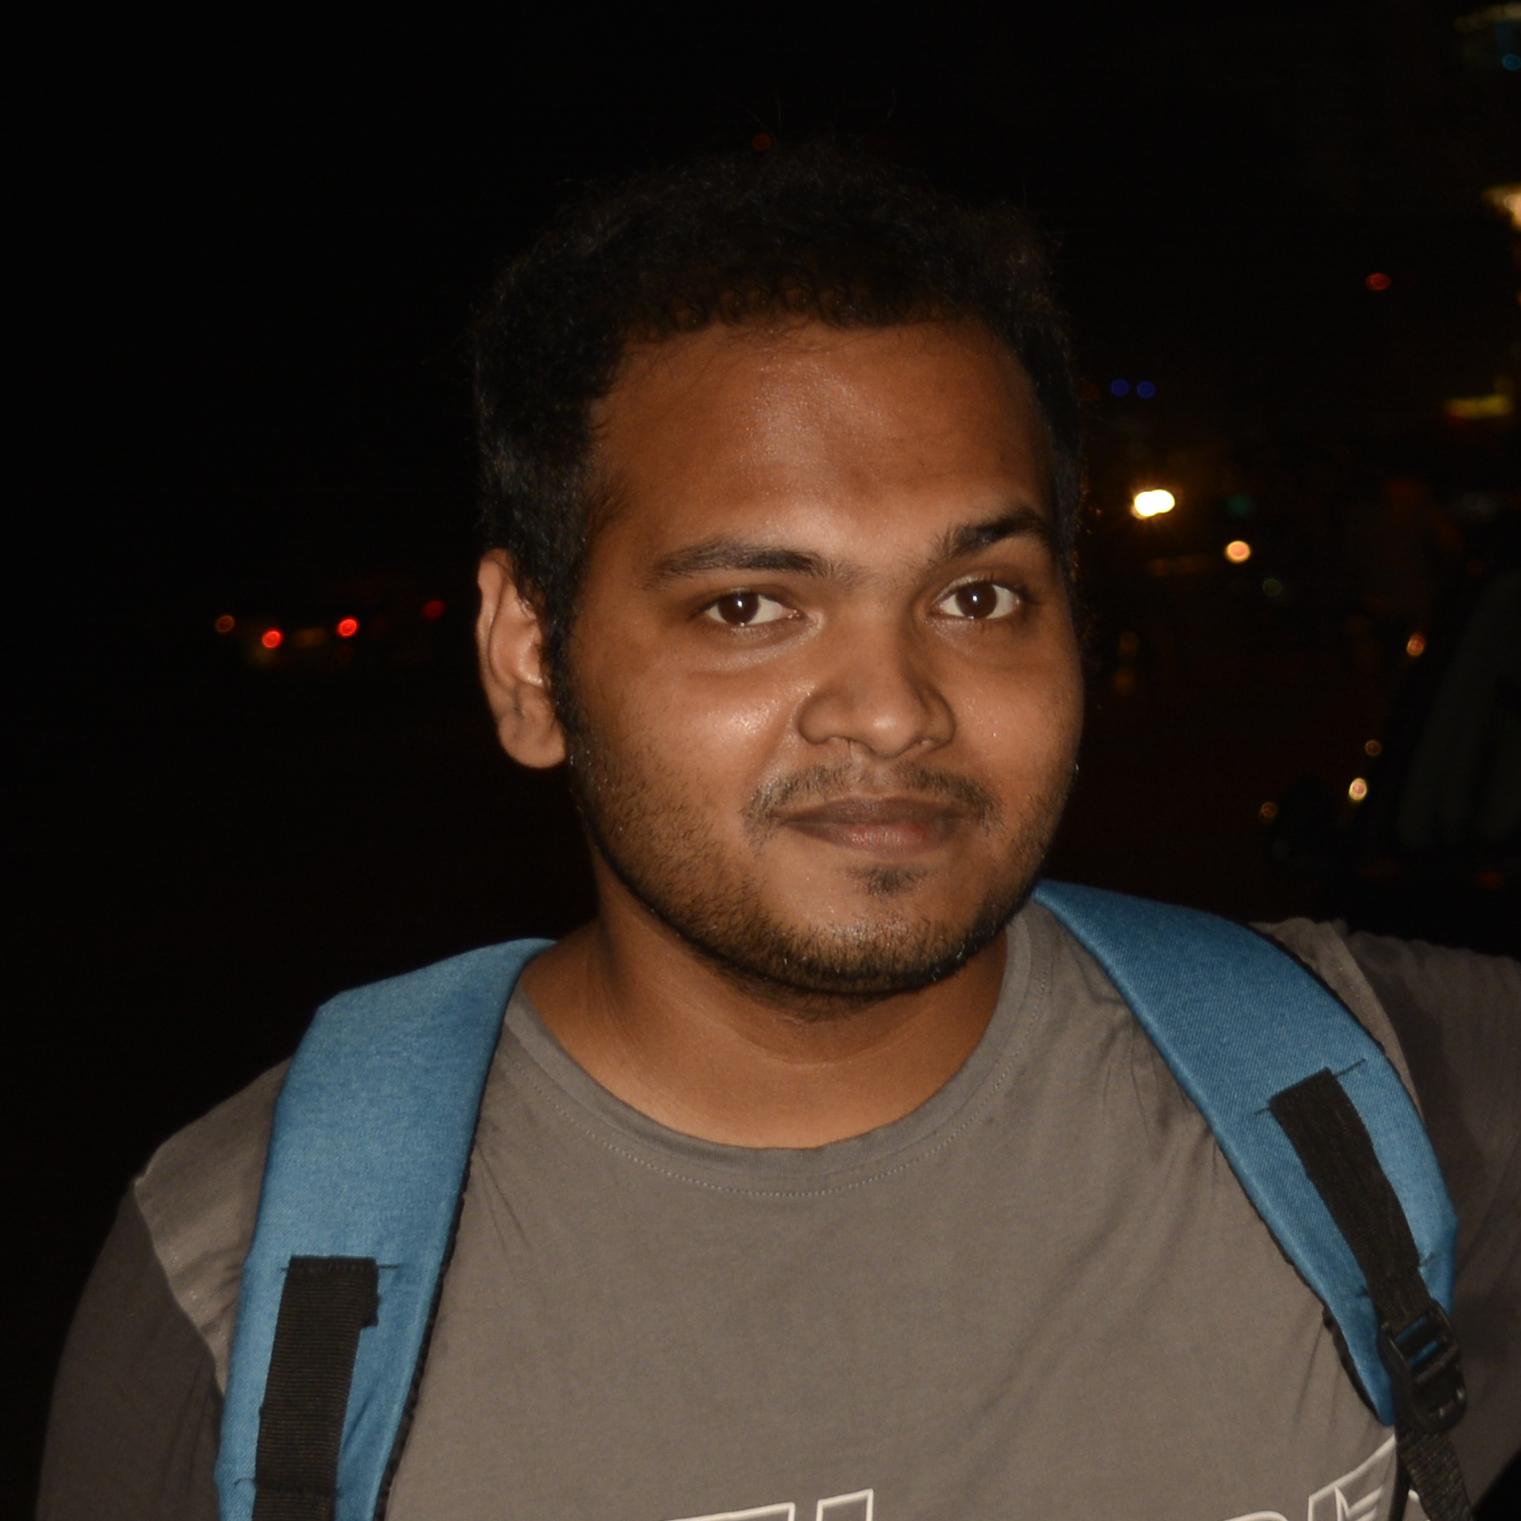 sultanmahmud